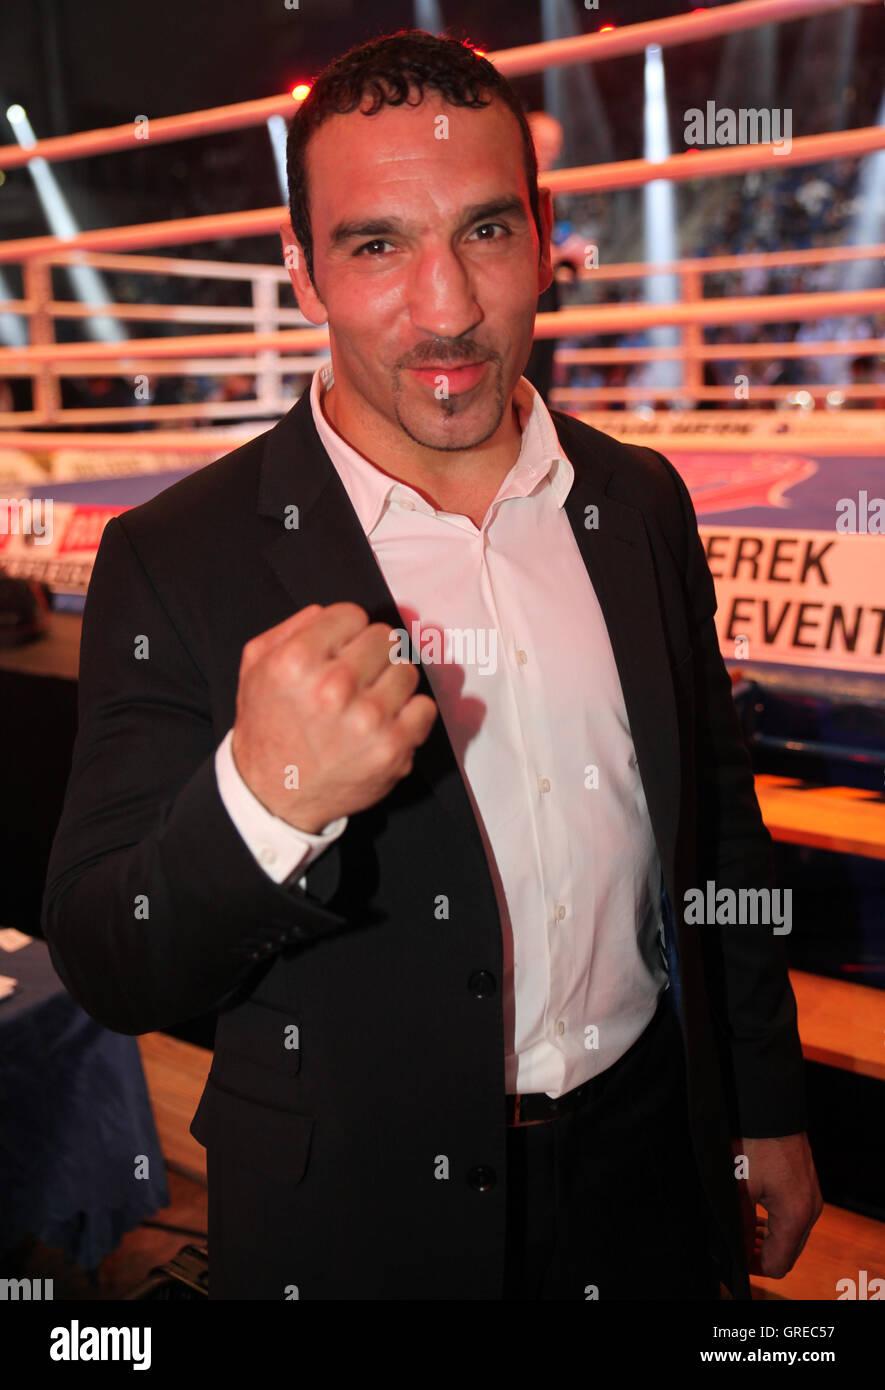 Arslan Firat The Wba World Championship Fight Chagaev Vs. Pianeta On 11 July 2015 In Magdeburg Stock Photo